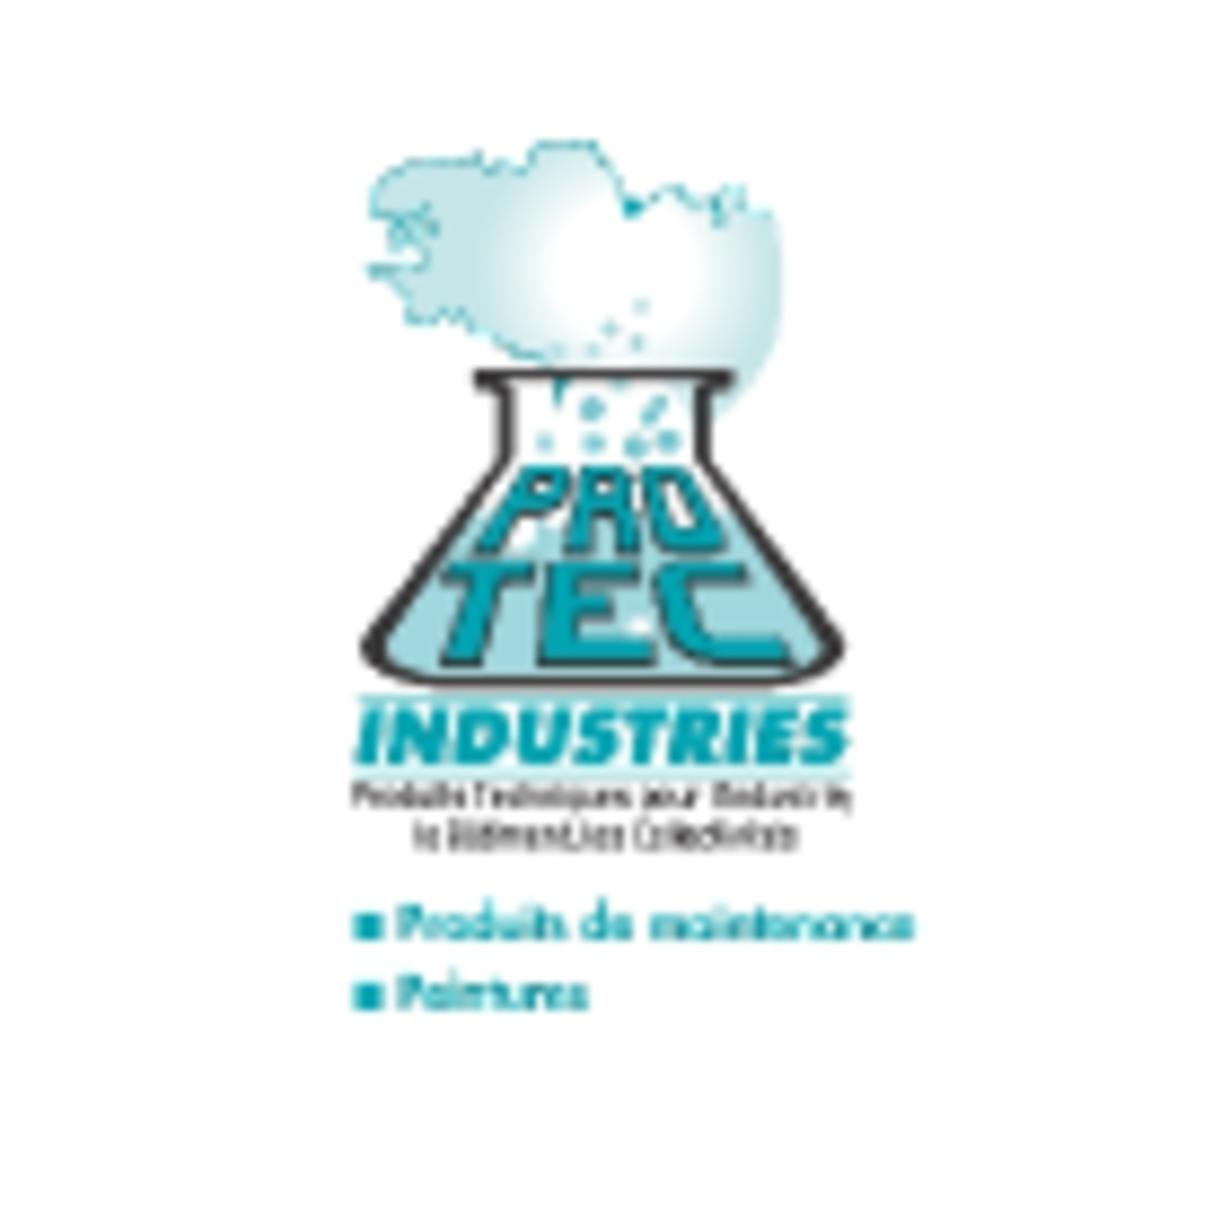 protec industries